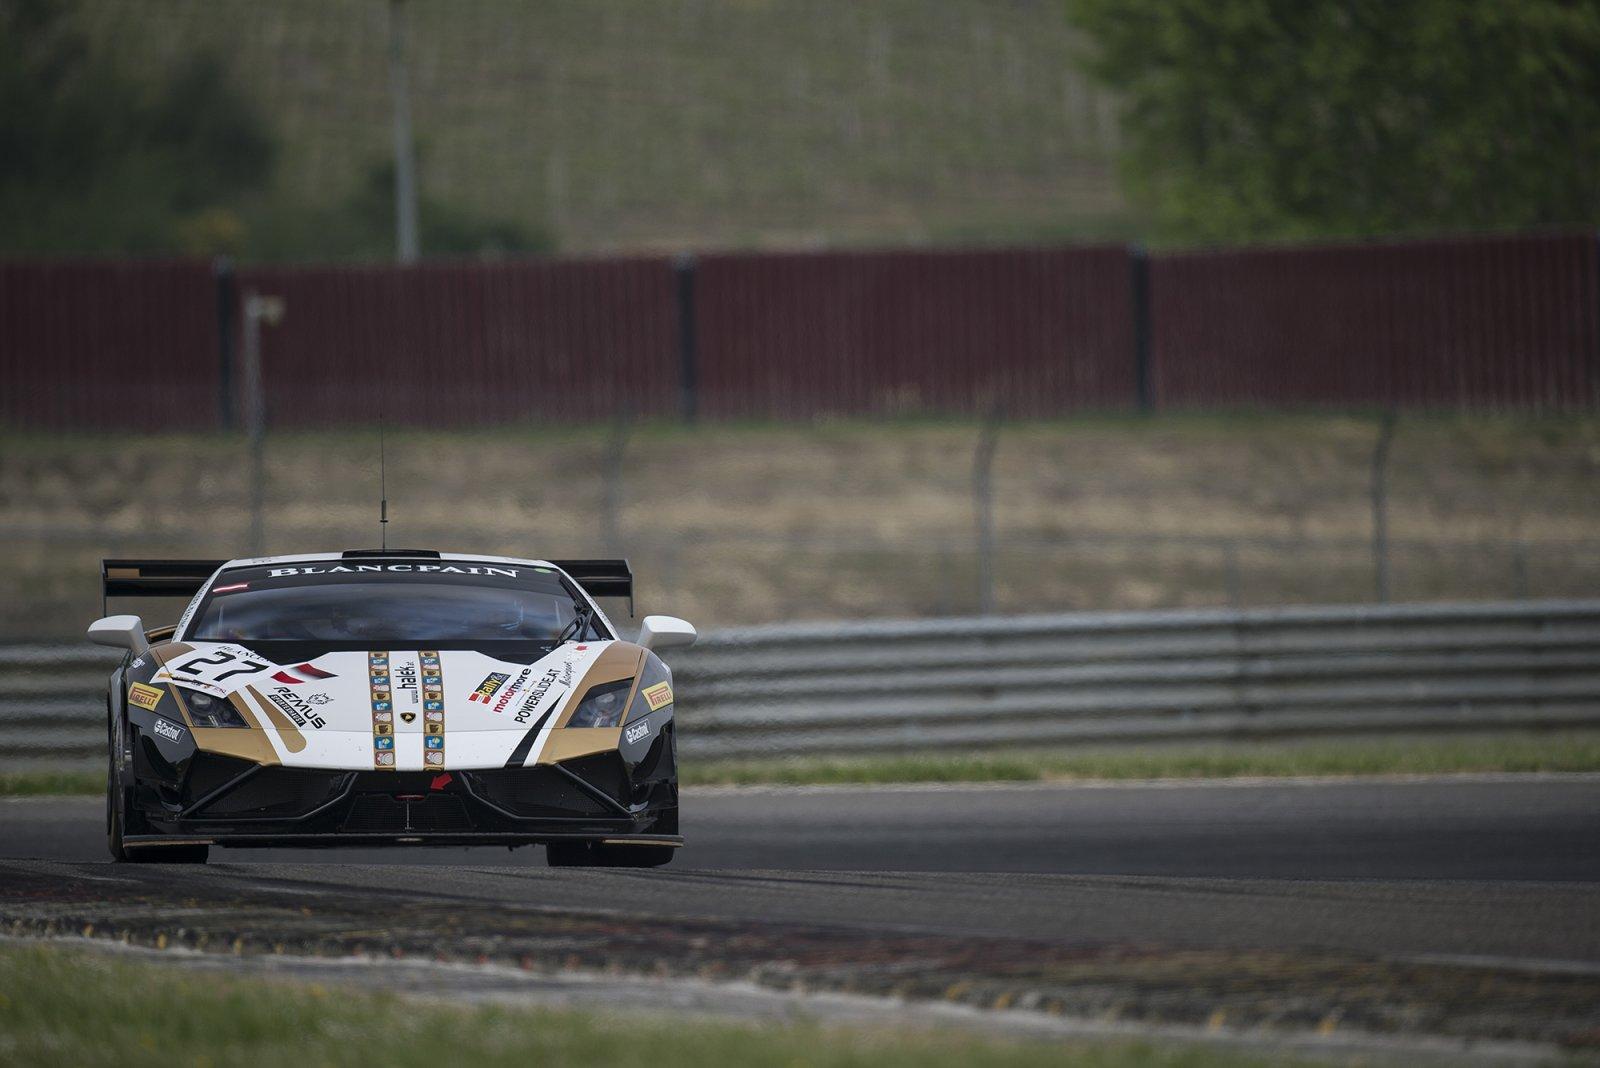 Stefan Landmann to join Grasser Racing Team for the Blancpain Sprint Series